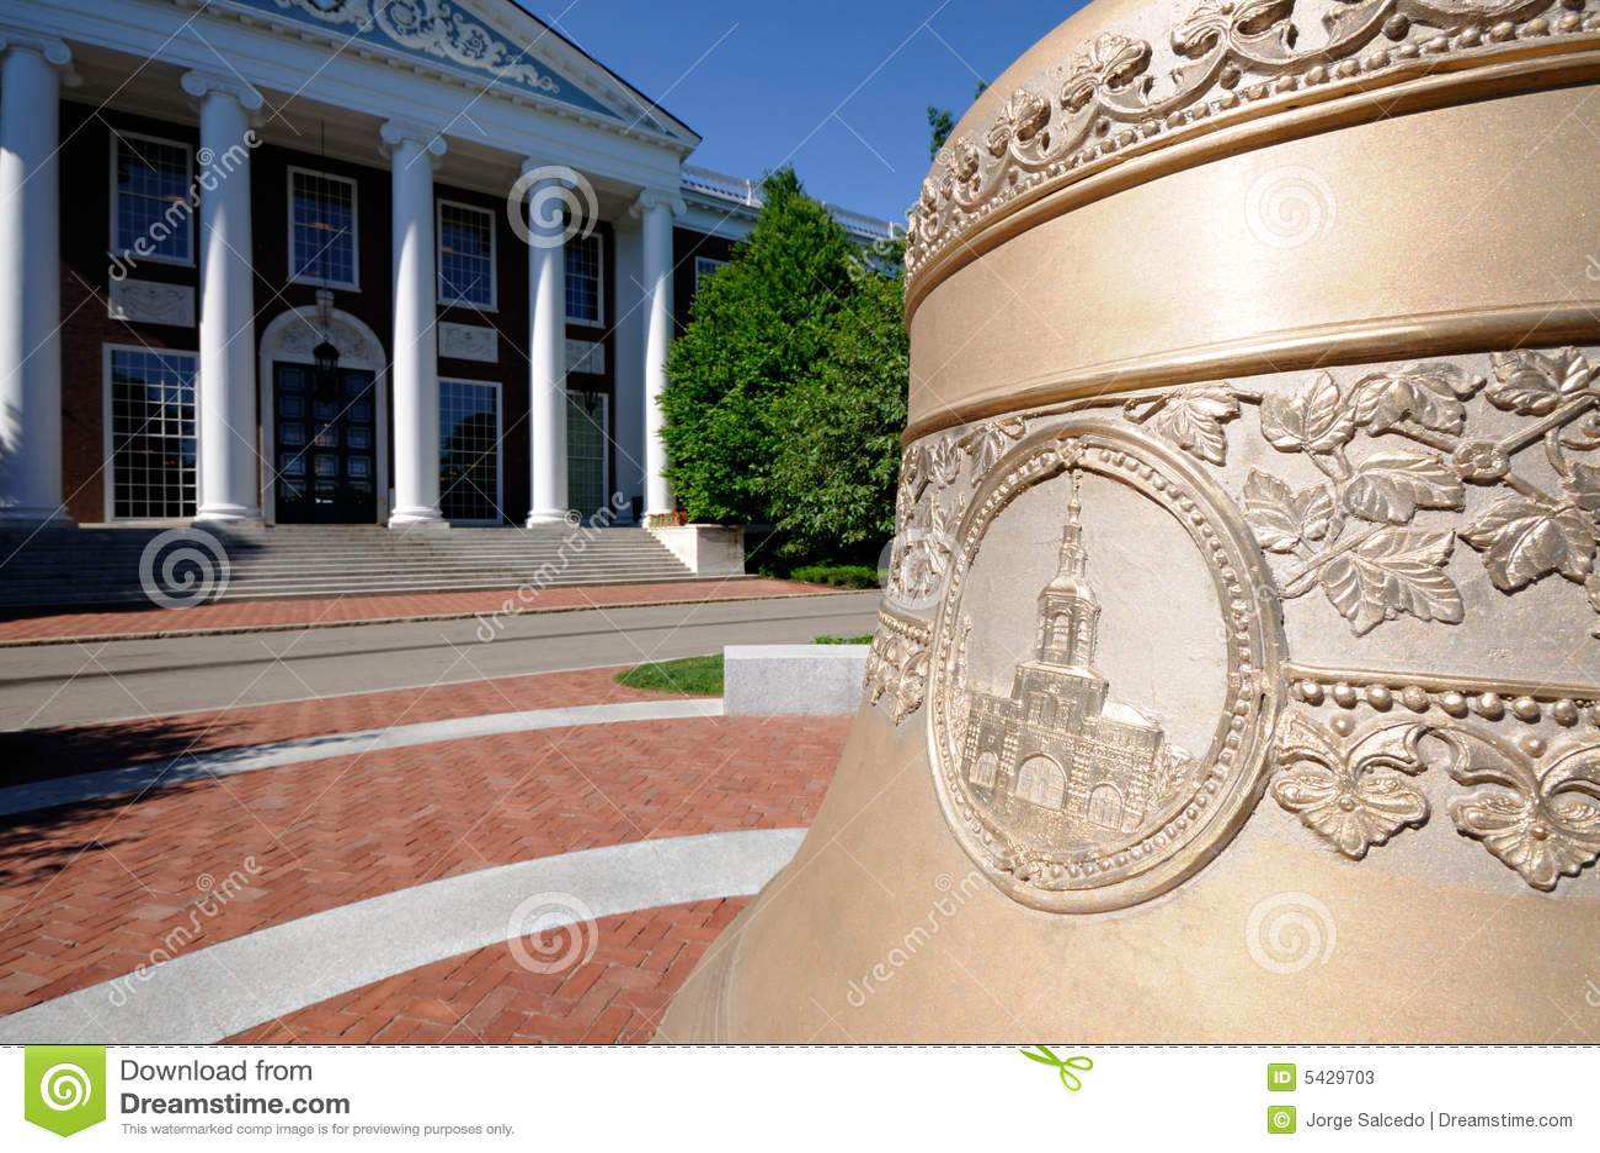 Centenial Bell at Harvard Business School